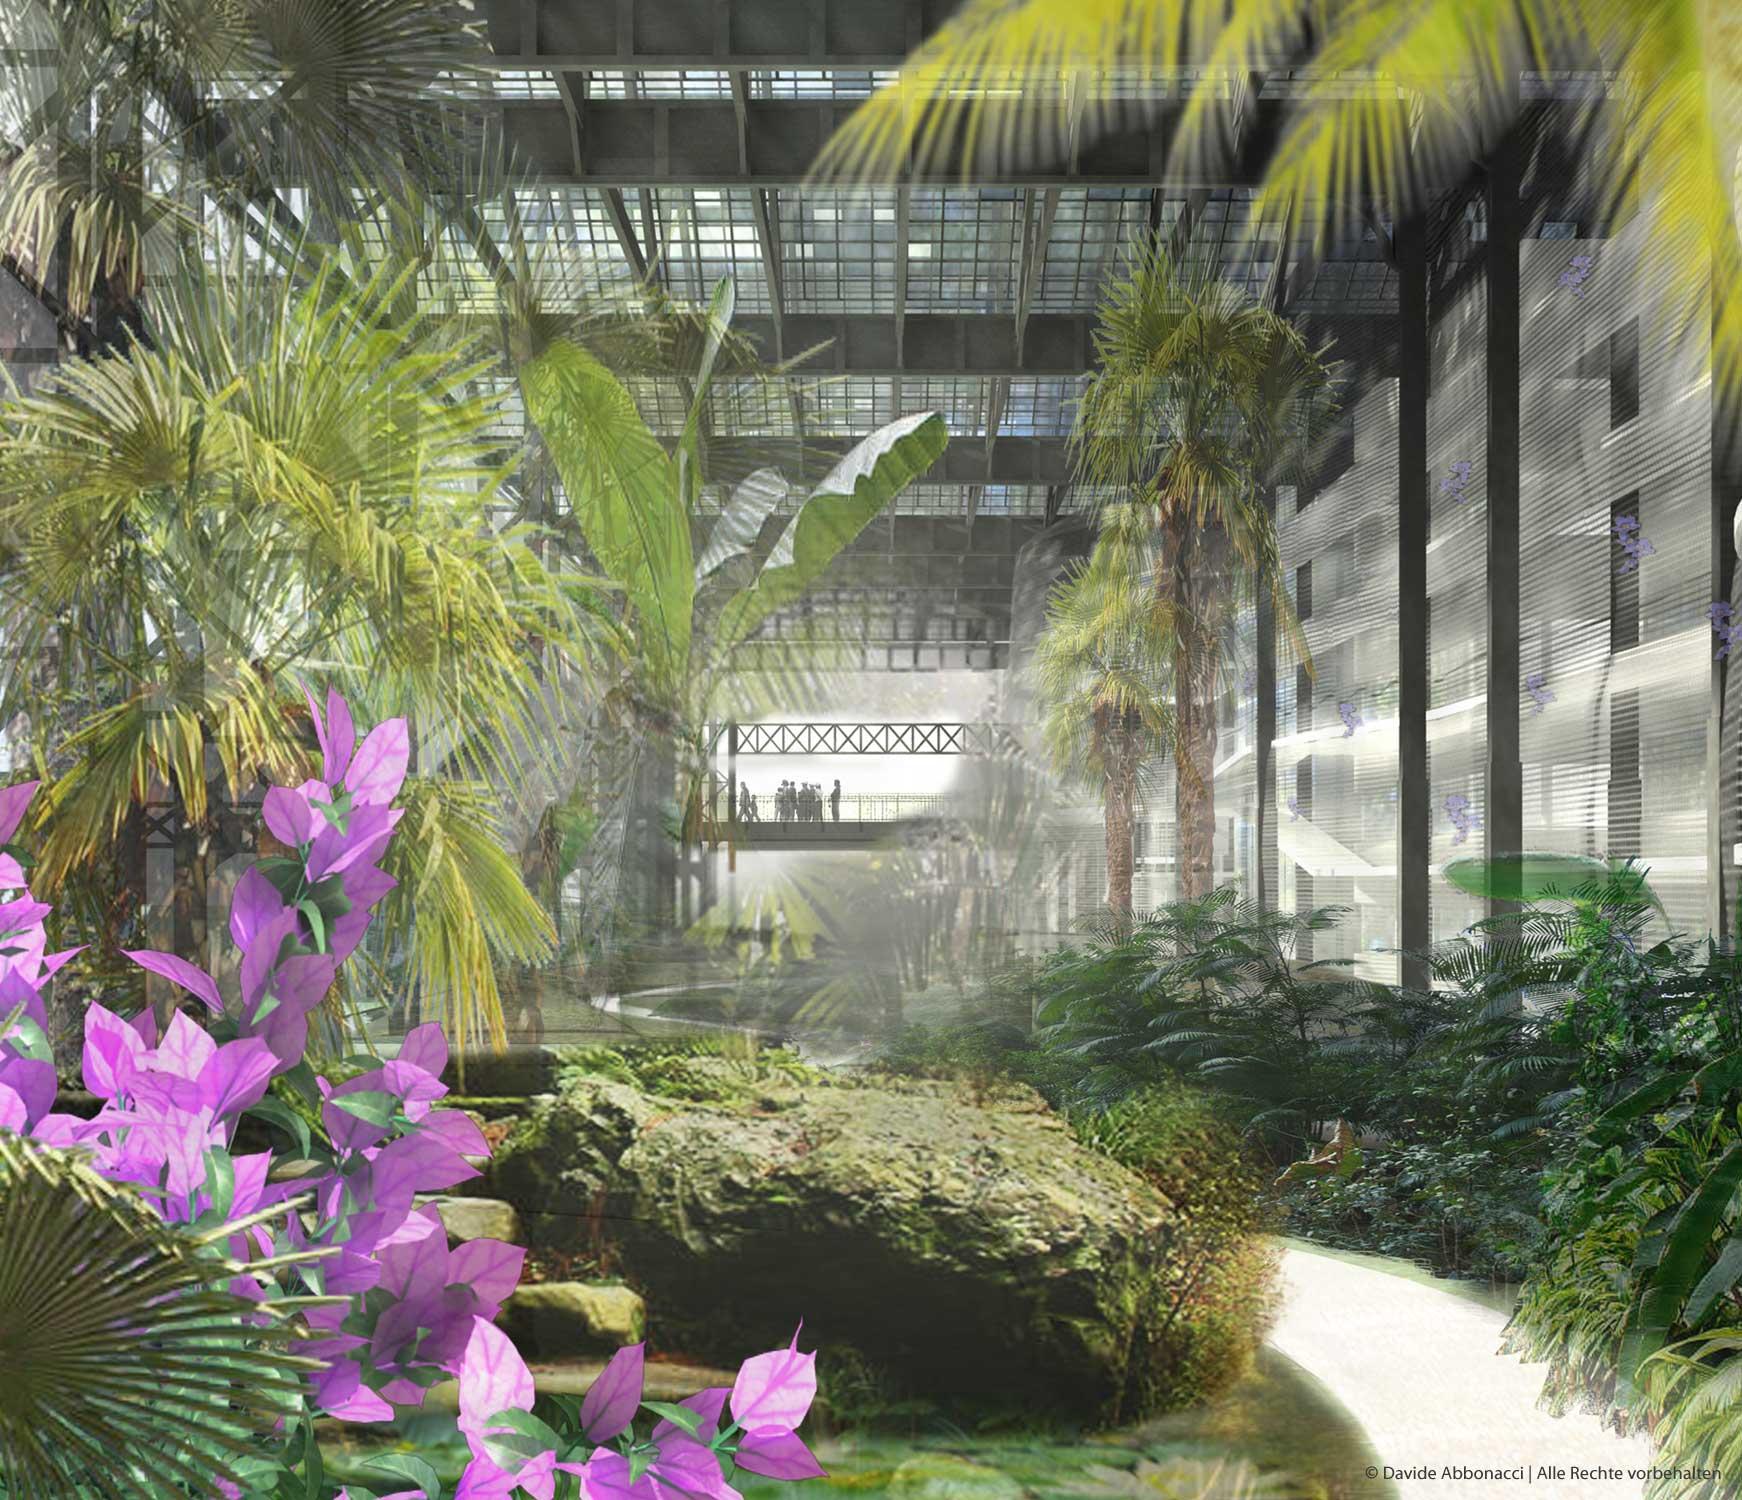 Paris Zac Pajol, Paris | LIN Architects Urbanists | 2007 Wettbewerbsvisualisierung